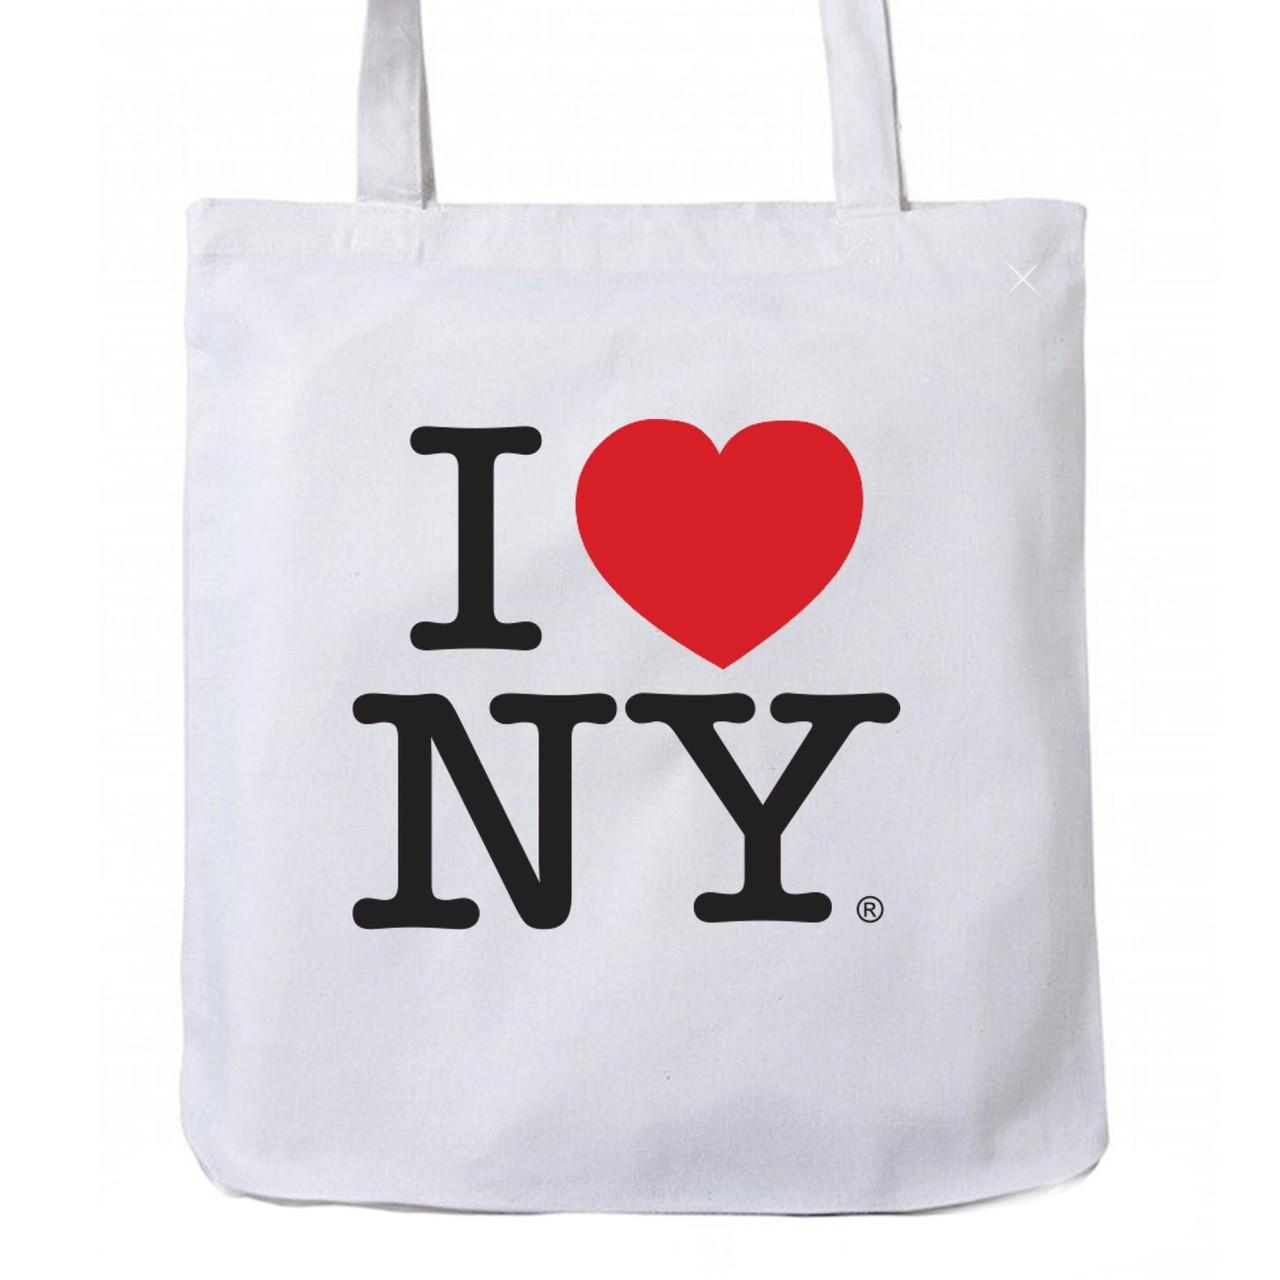 b9c0a3ab2704 I Love NY Tote Bag White